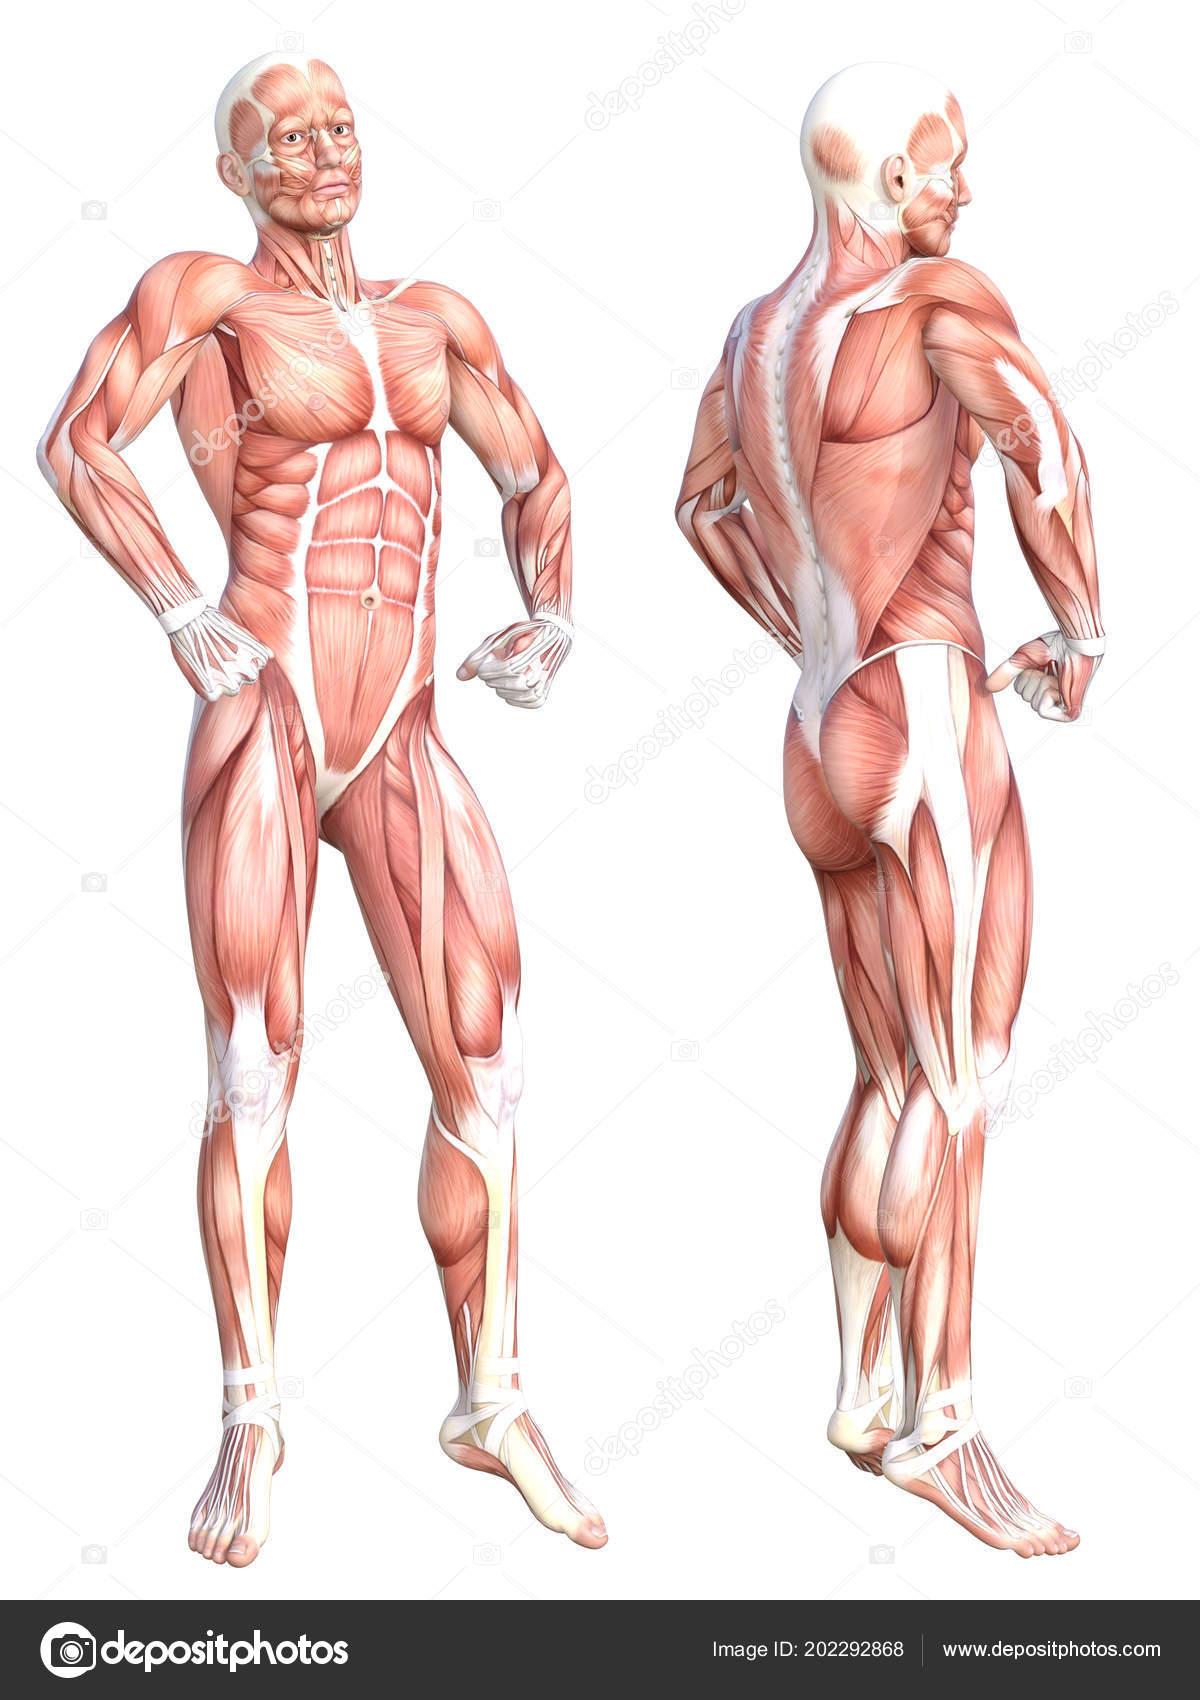 Anatomie Corps Humain Homme conceptuel anatomie corps humain sans peau saine muscle système